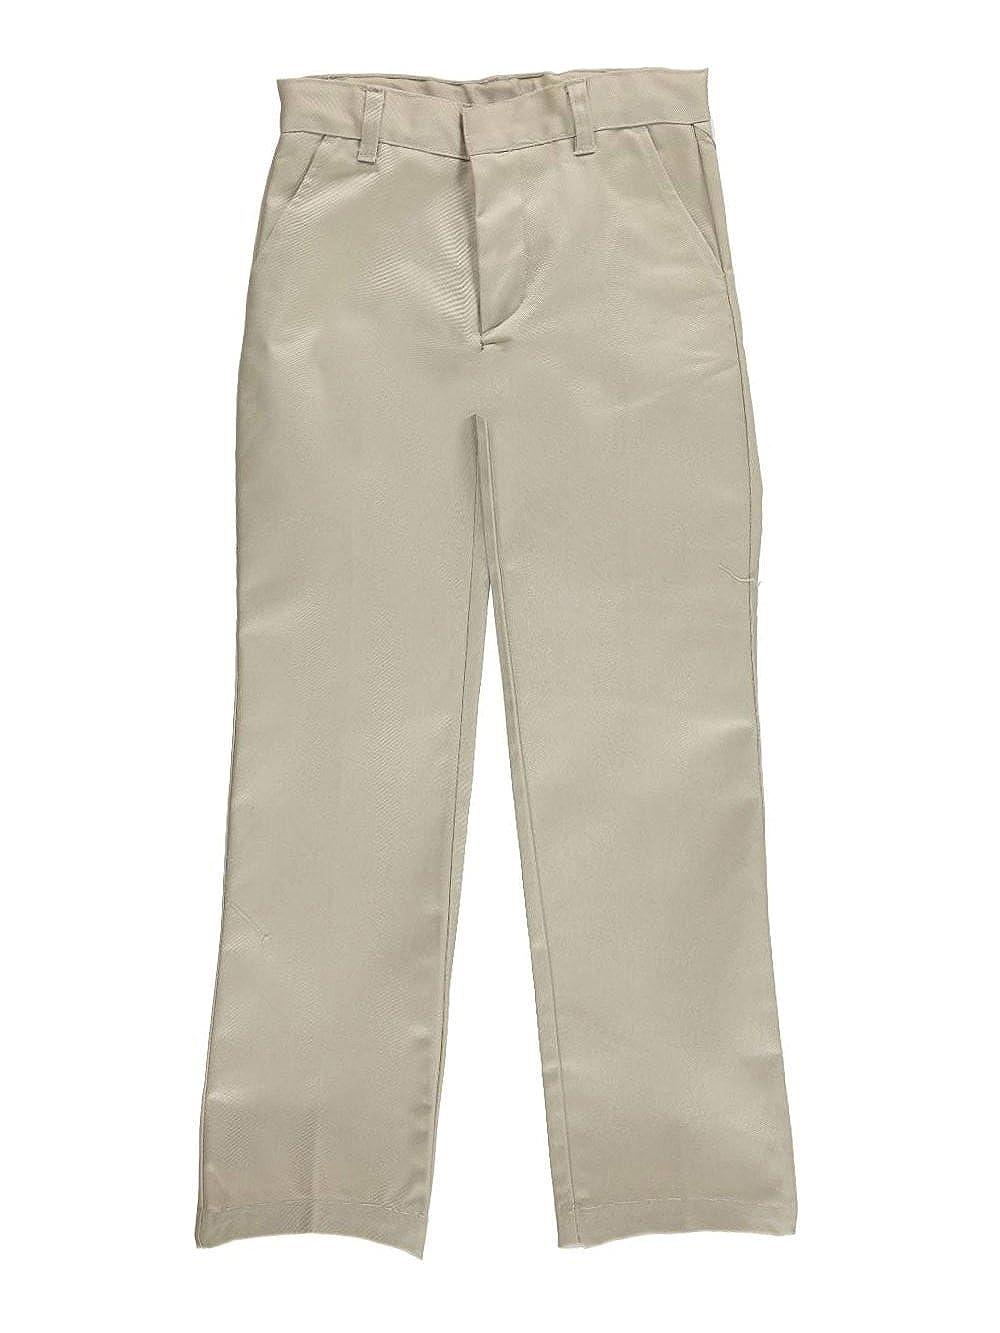 French Toast Big Girls' Stretch Twill Uniform Pants - khaki, 12